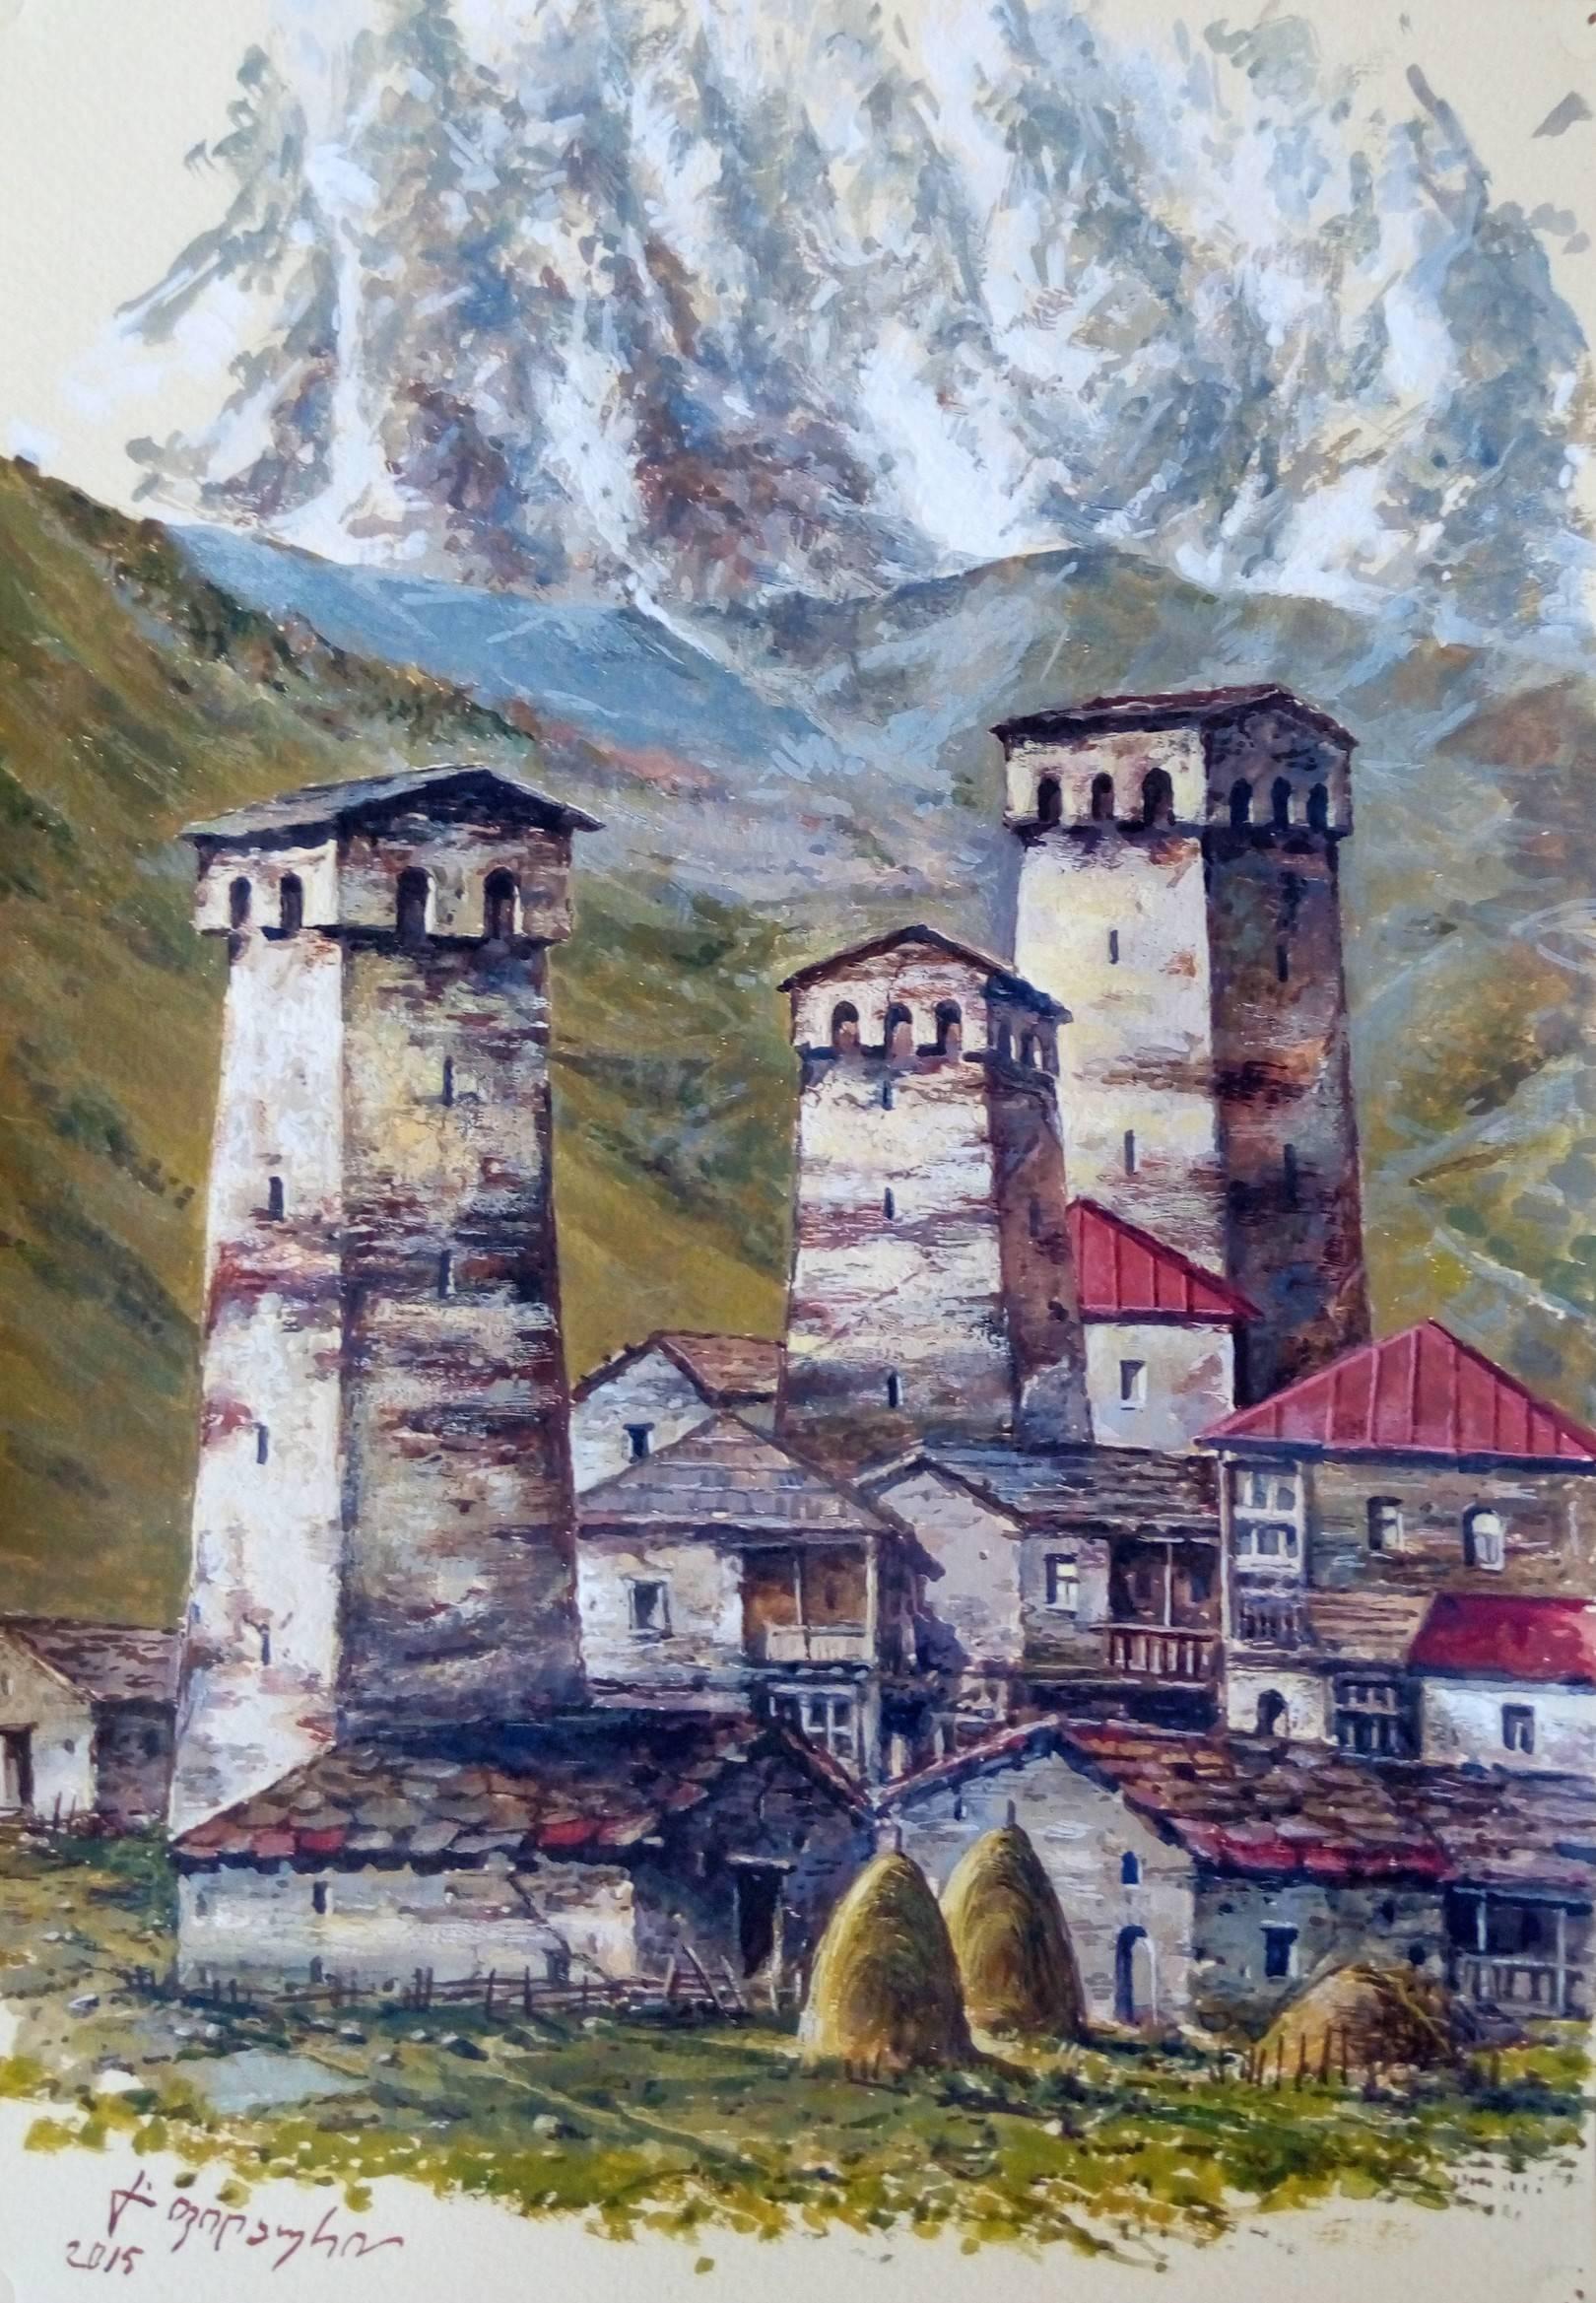 «Сванети»      бумага, акварель, гуашь «Svaneti»        paper, aquarelle, gouache  30x20, 2015